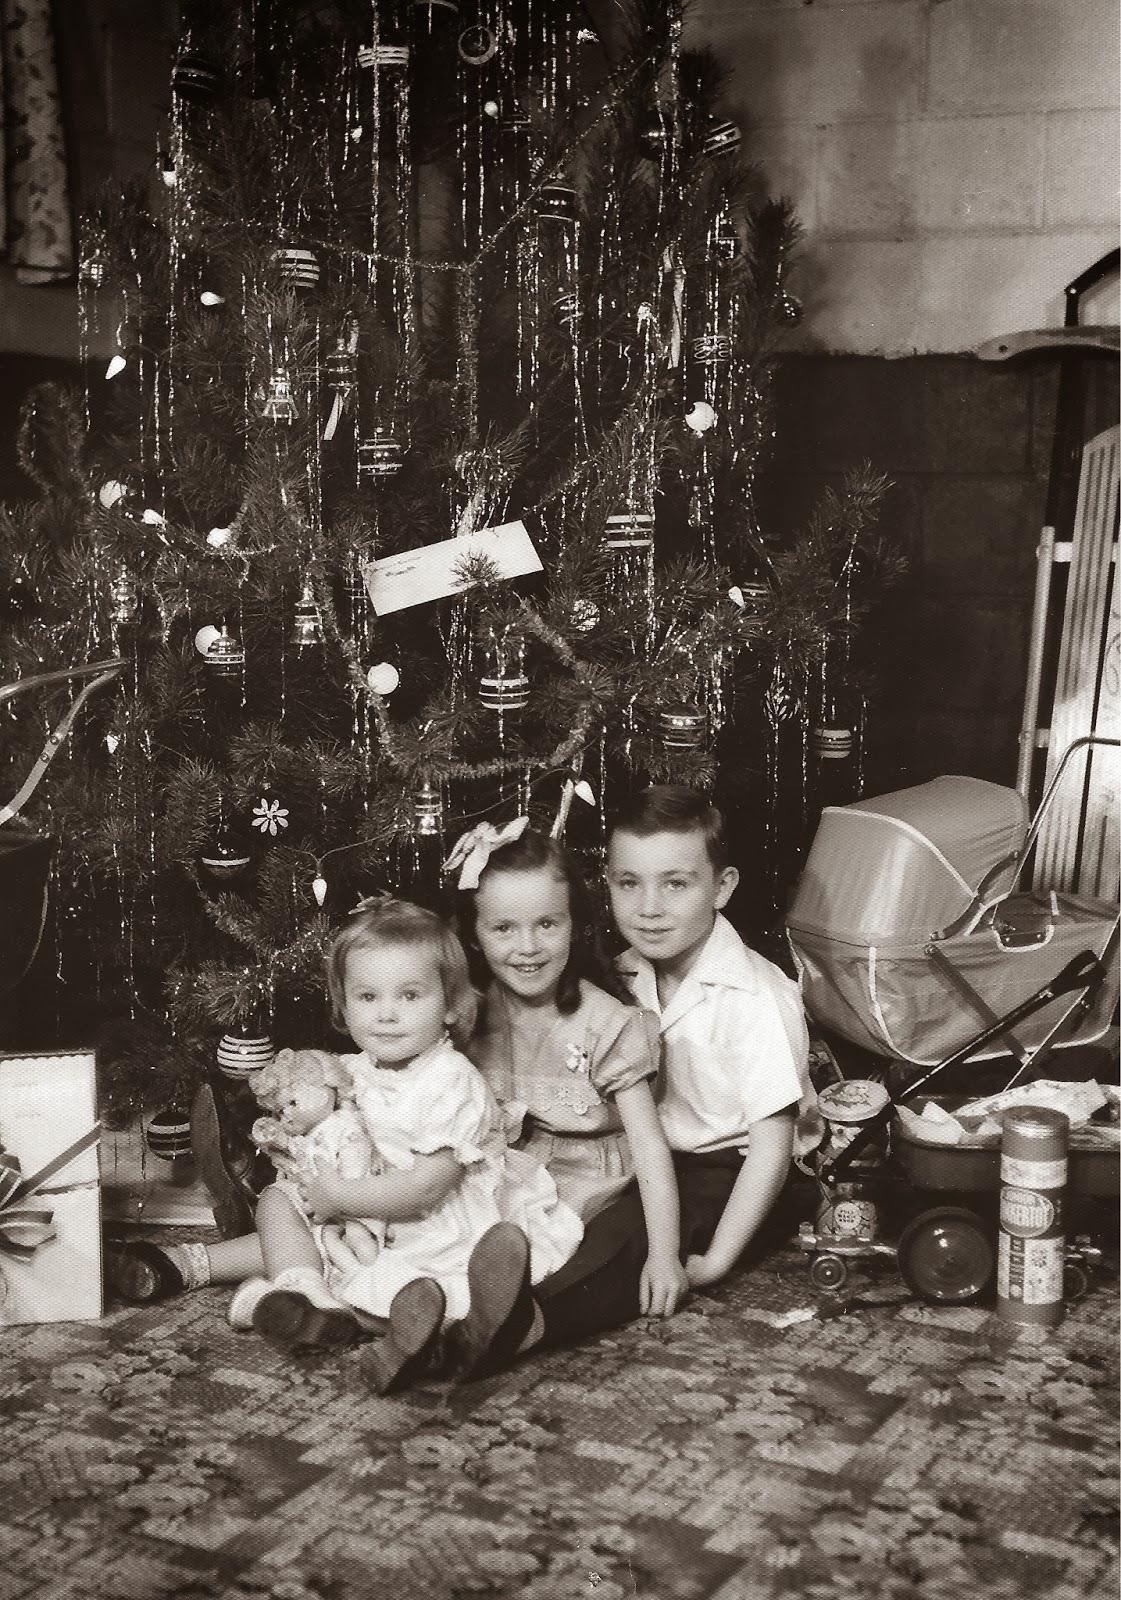 Relevant Tea Leaf Christmases Past